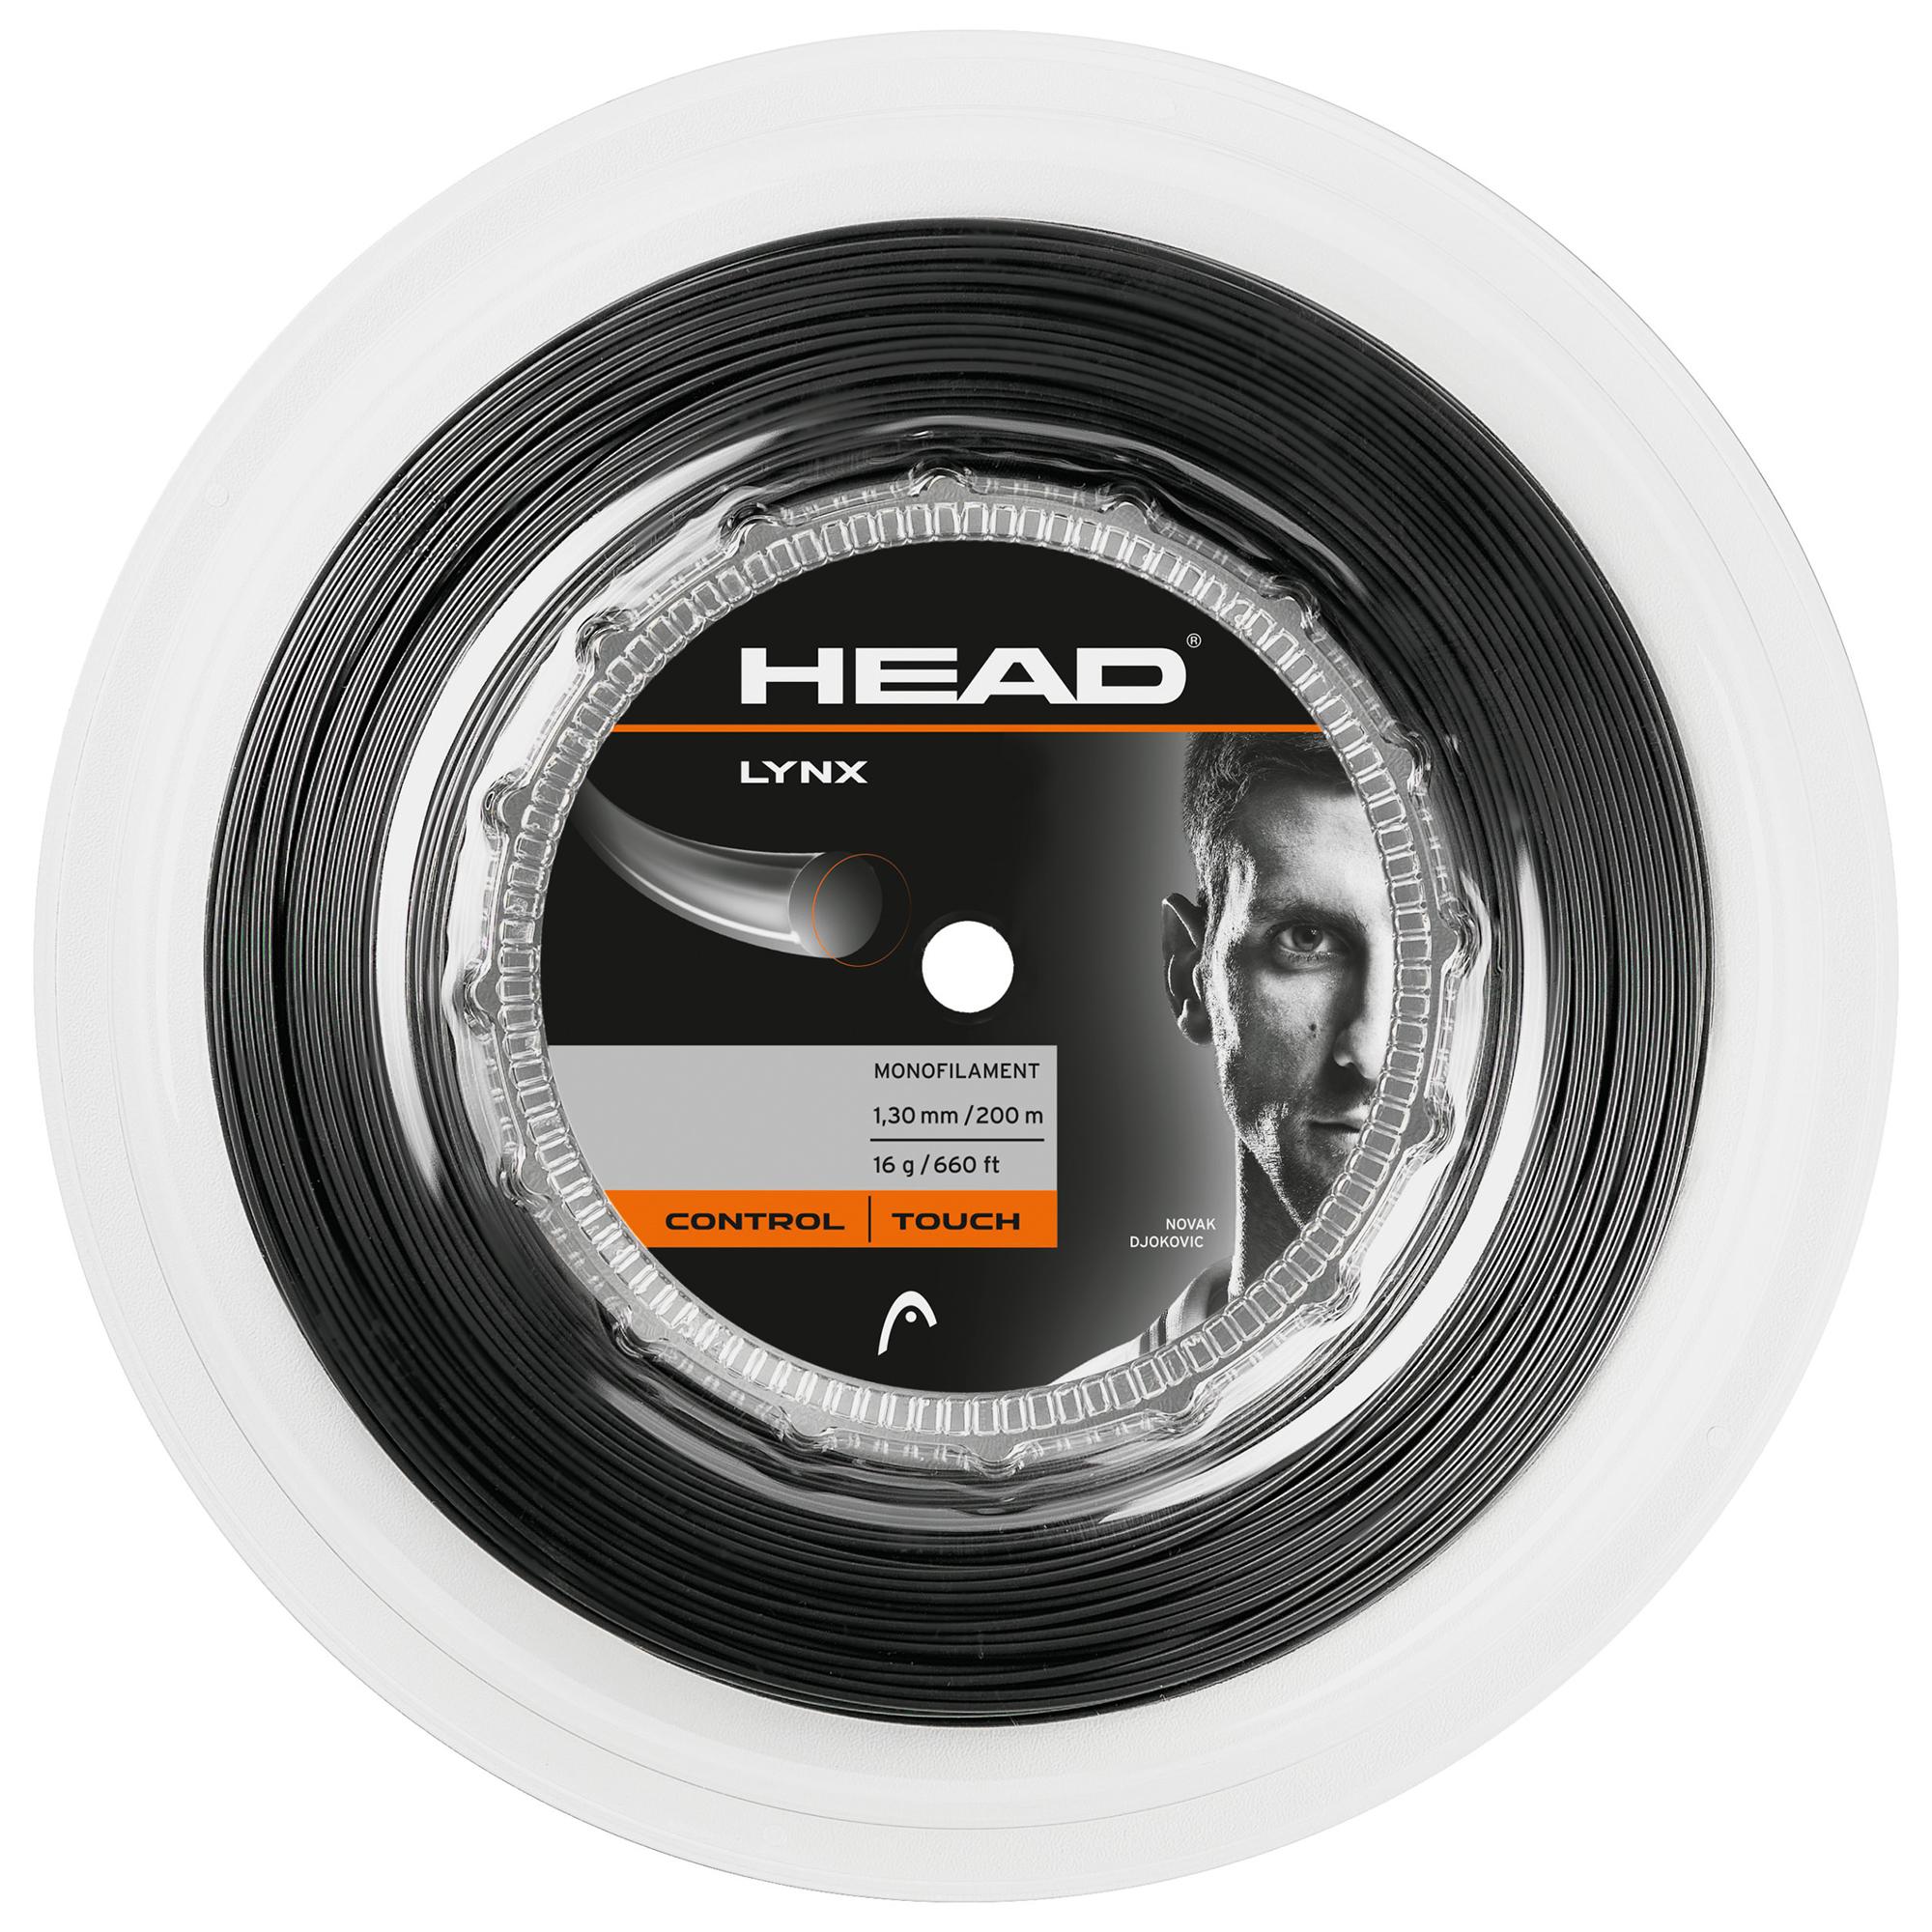 Head Lynx Tennis String 200m Reel  Black 1.30mm